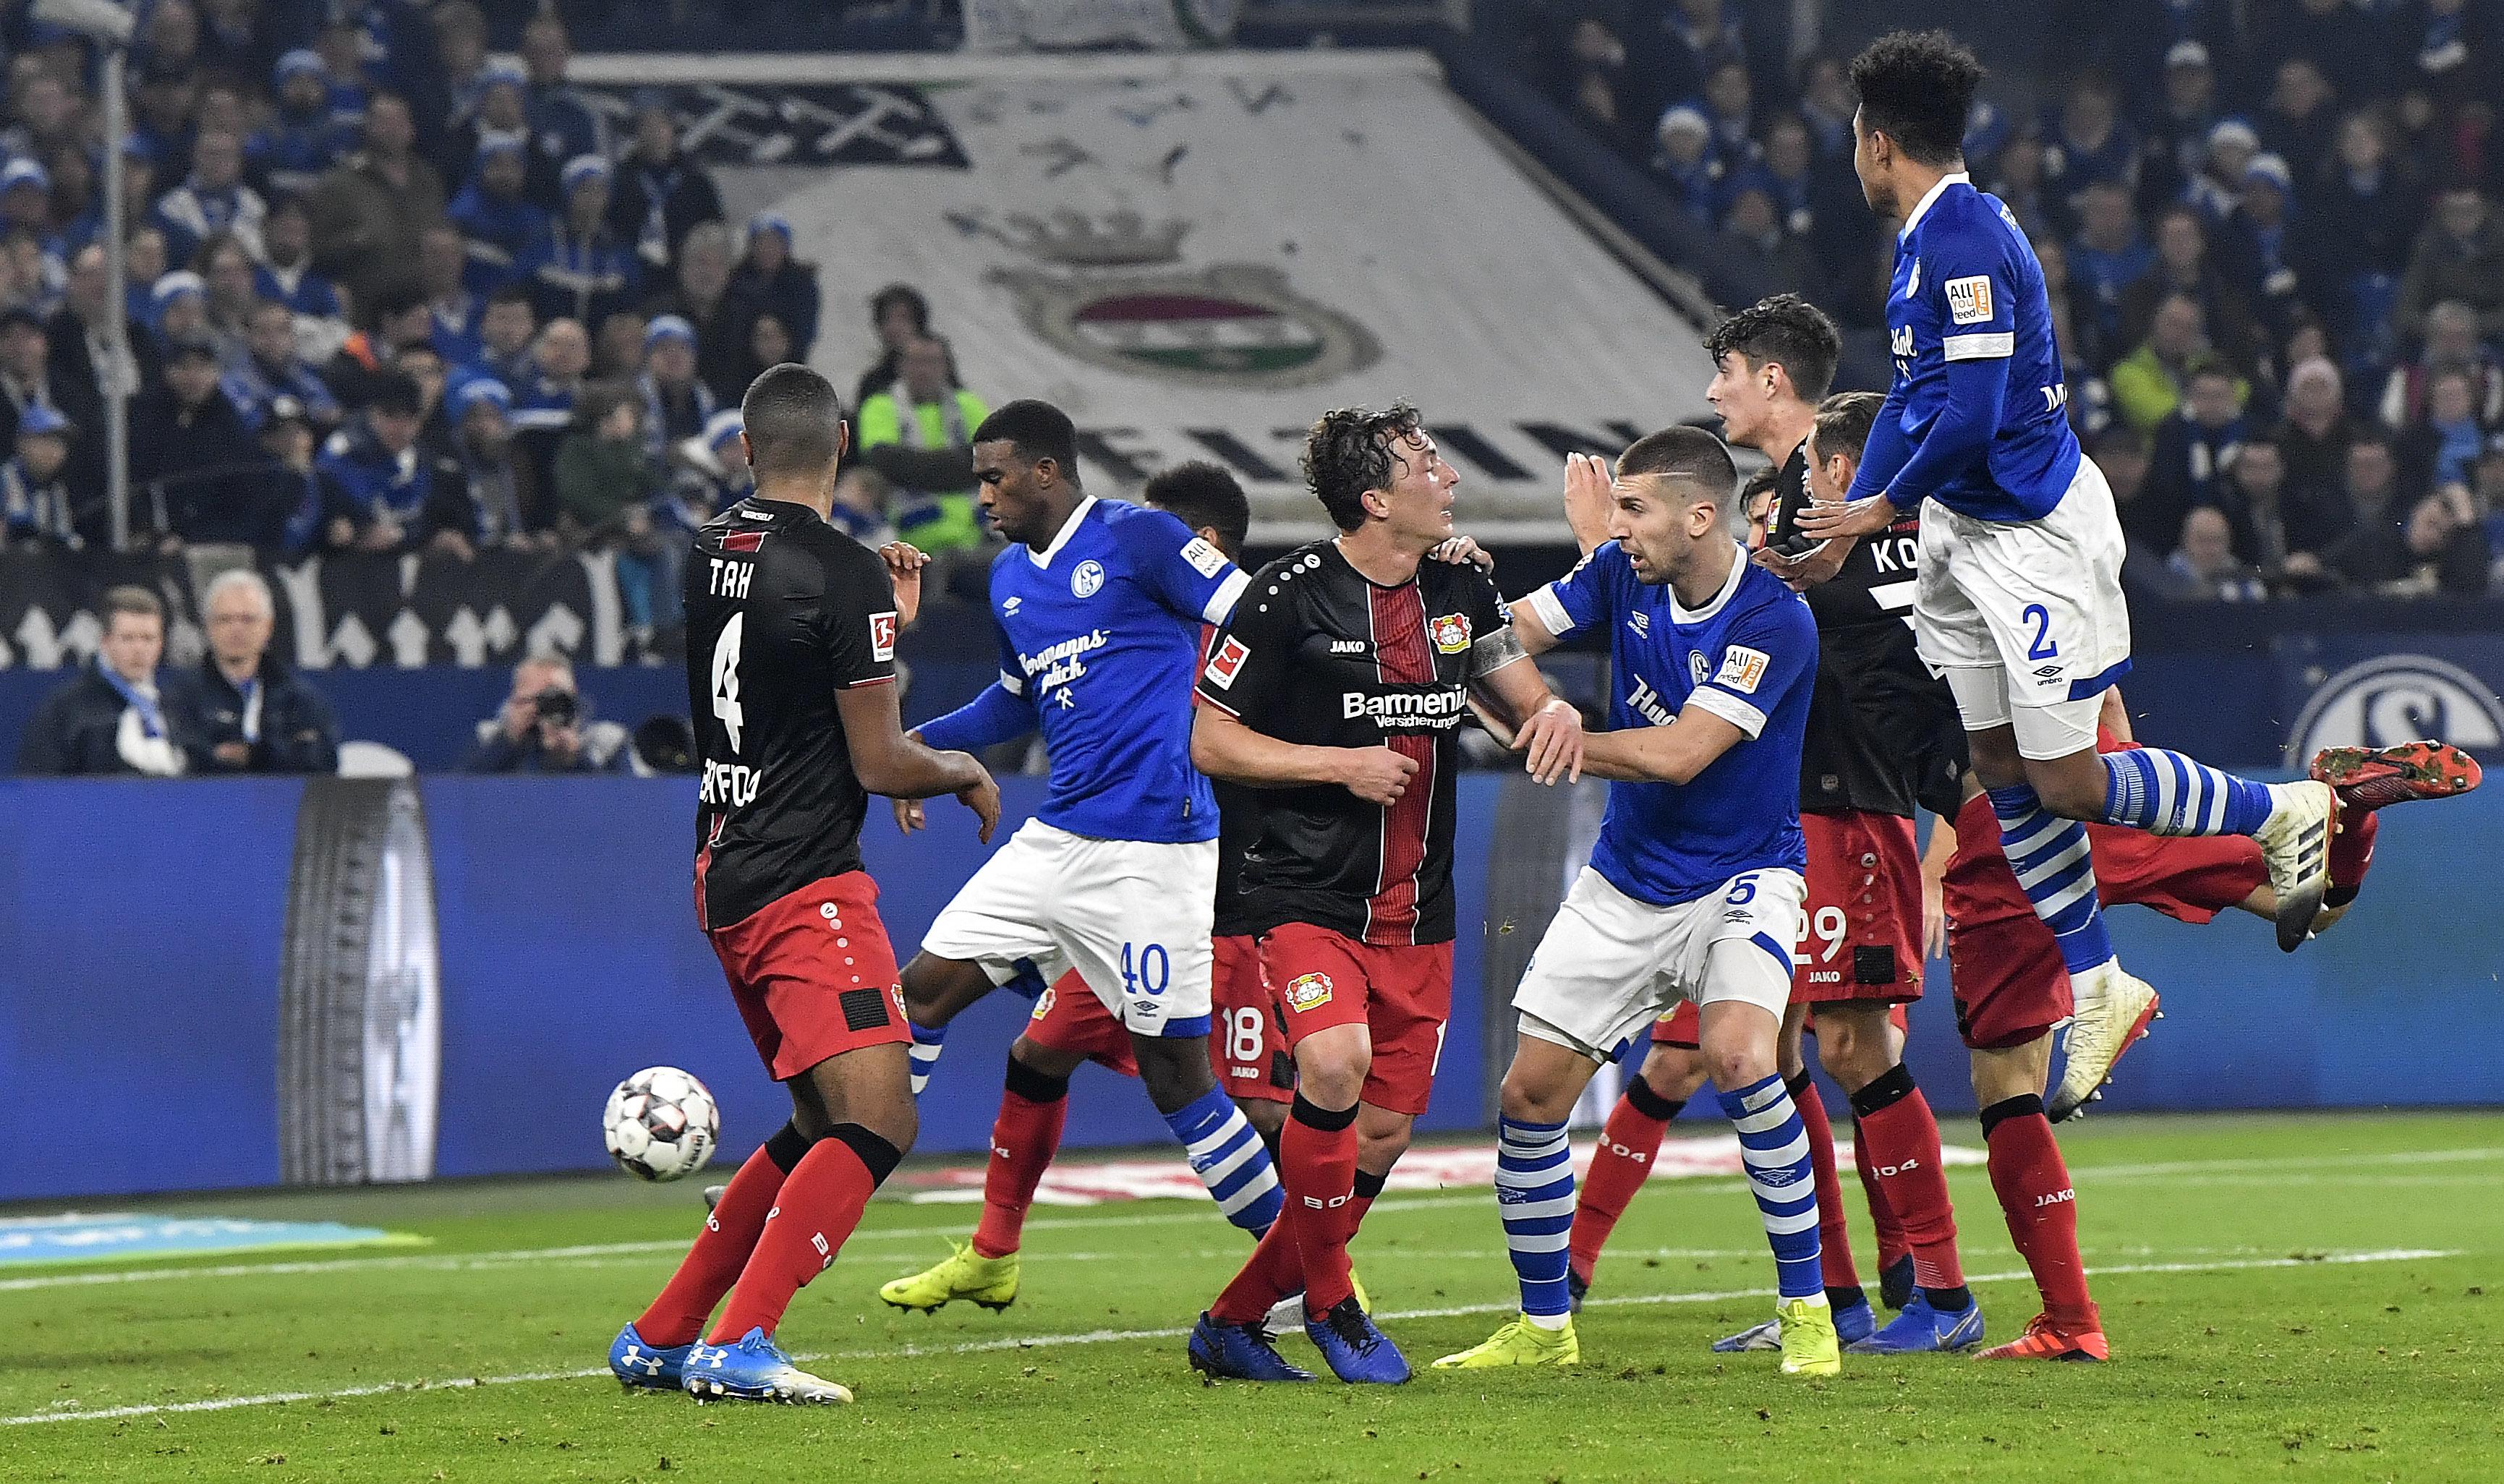 American forward Haji Wright, 20, gets first Bundesliga goal